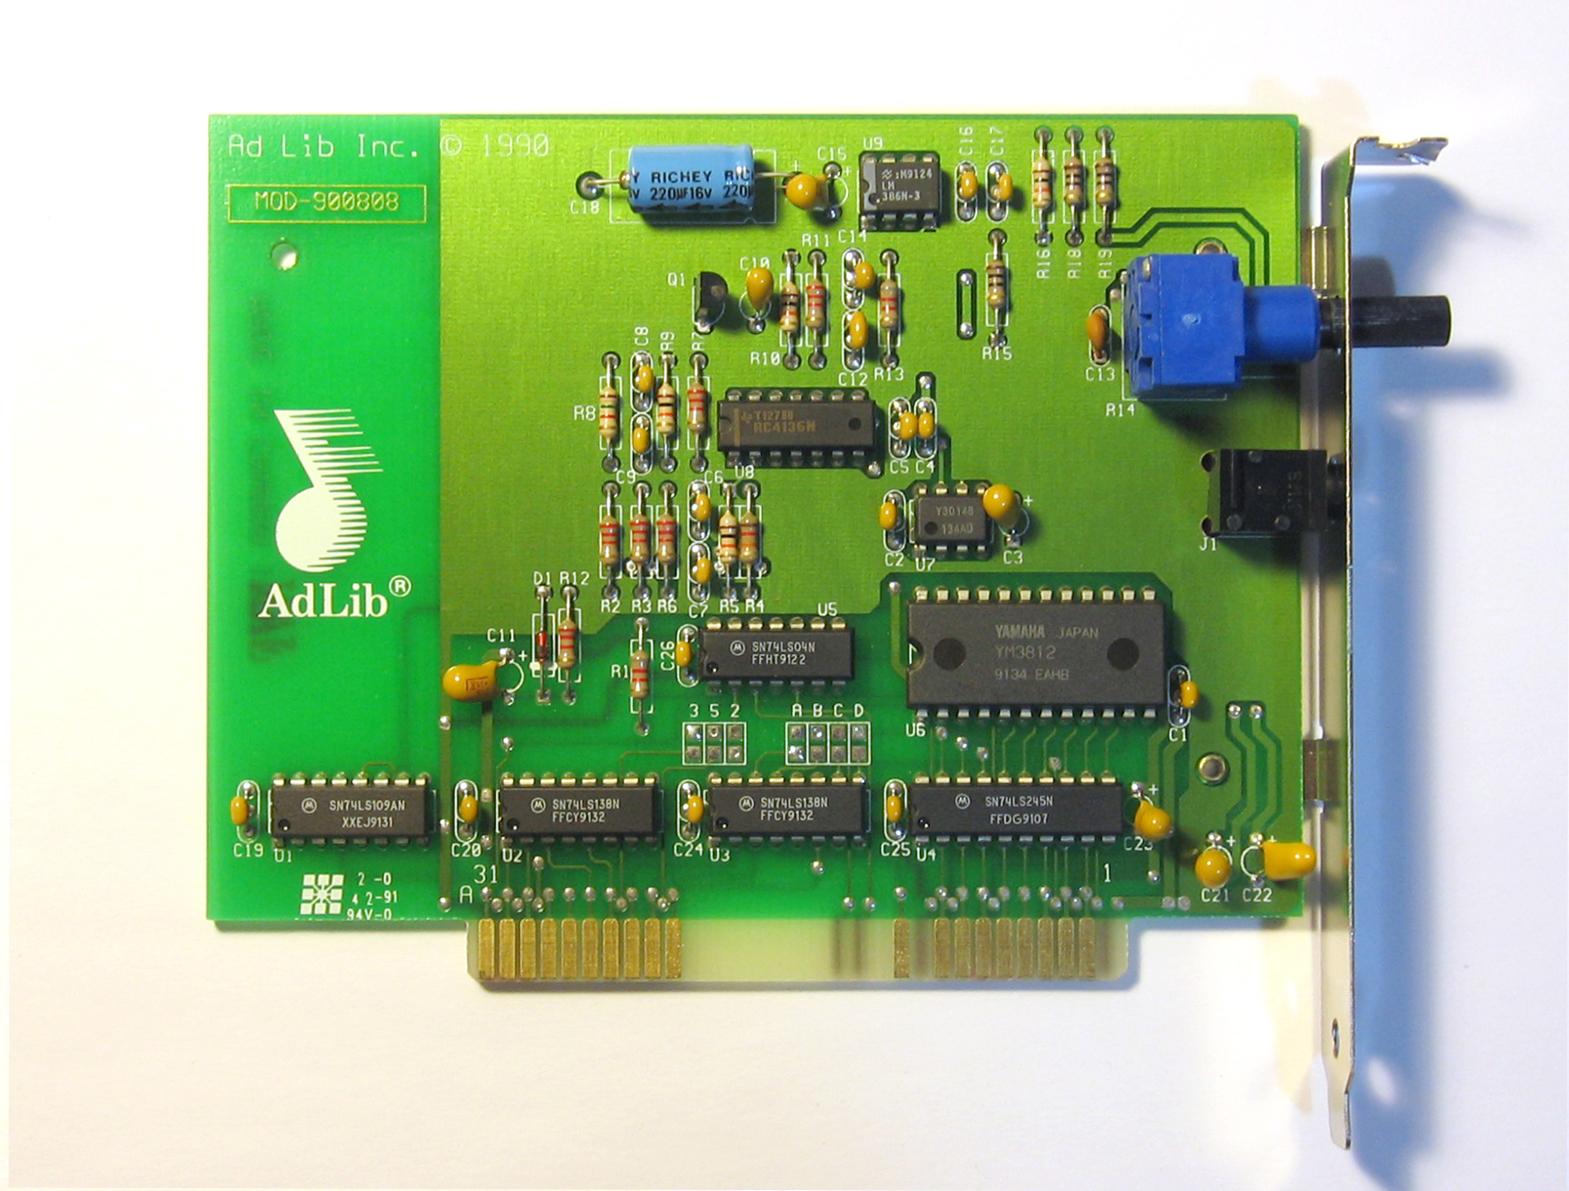 Fileadlib Sound Card Version 15 Wikimedia Commons Bmw X6 Fuse Box